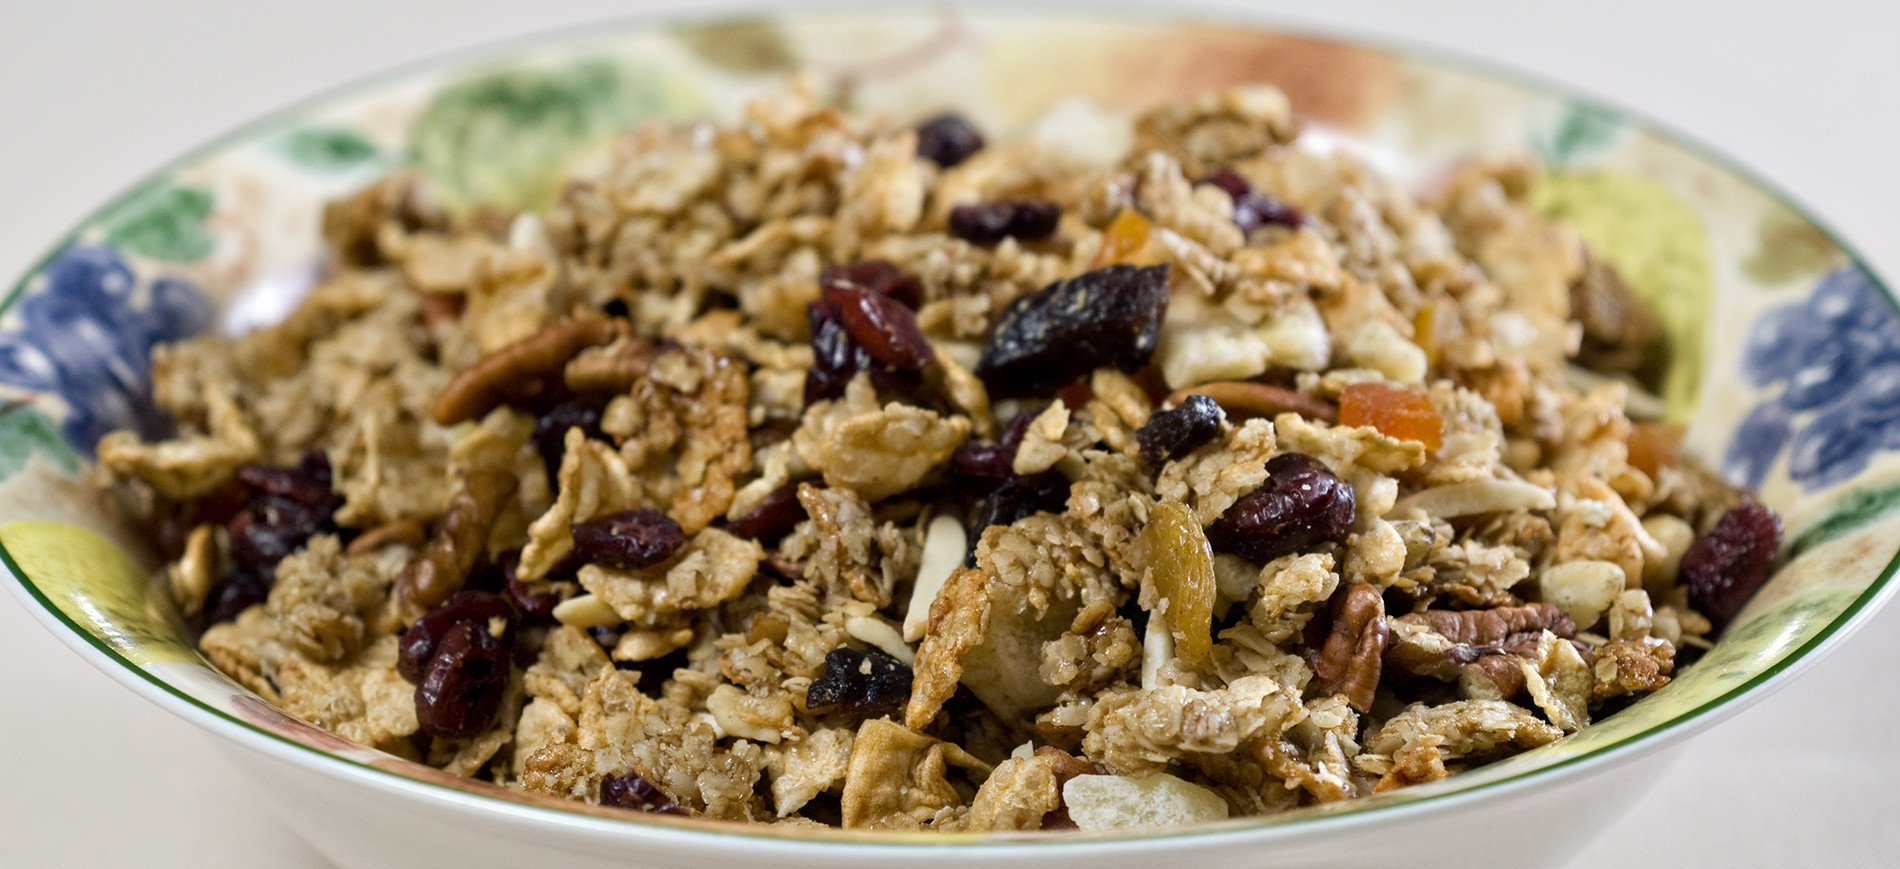 Serving bowl of granola